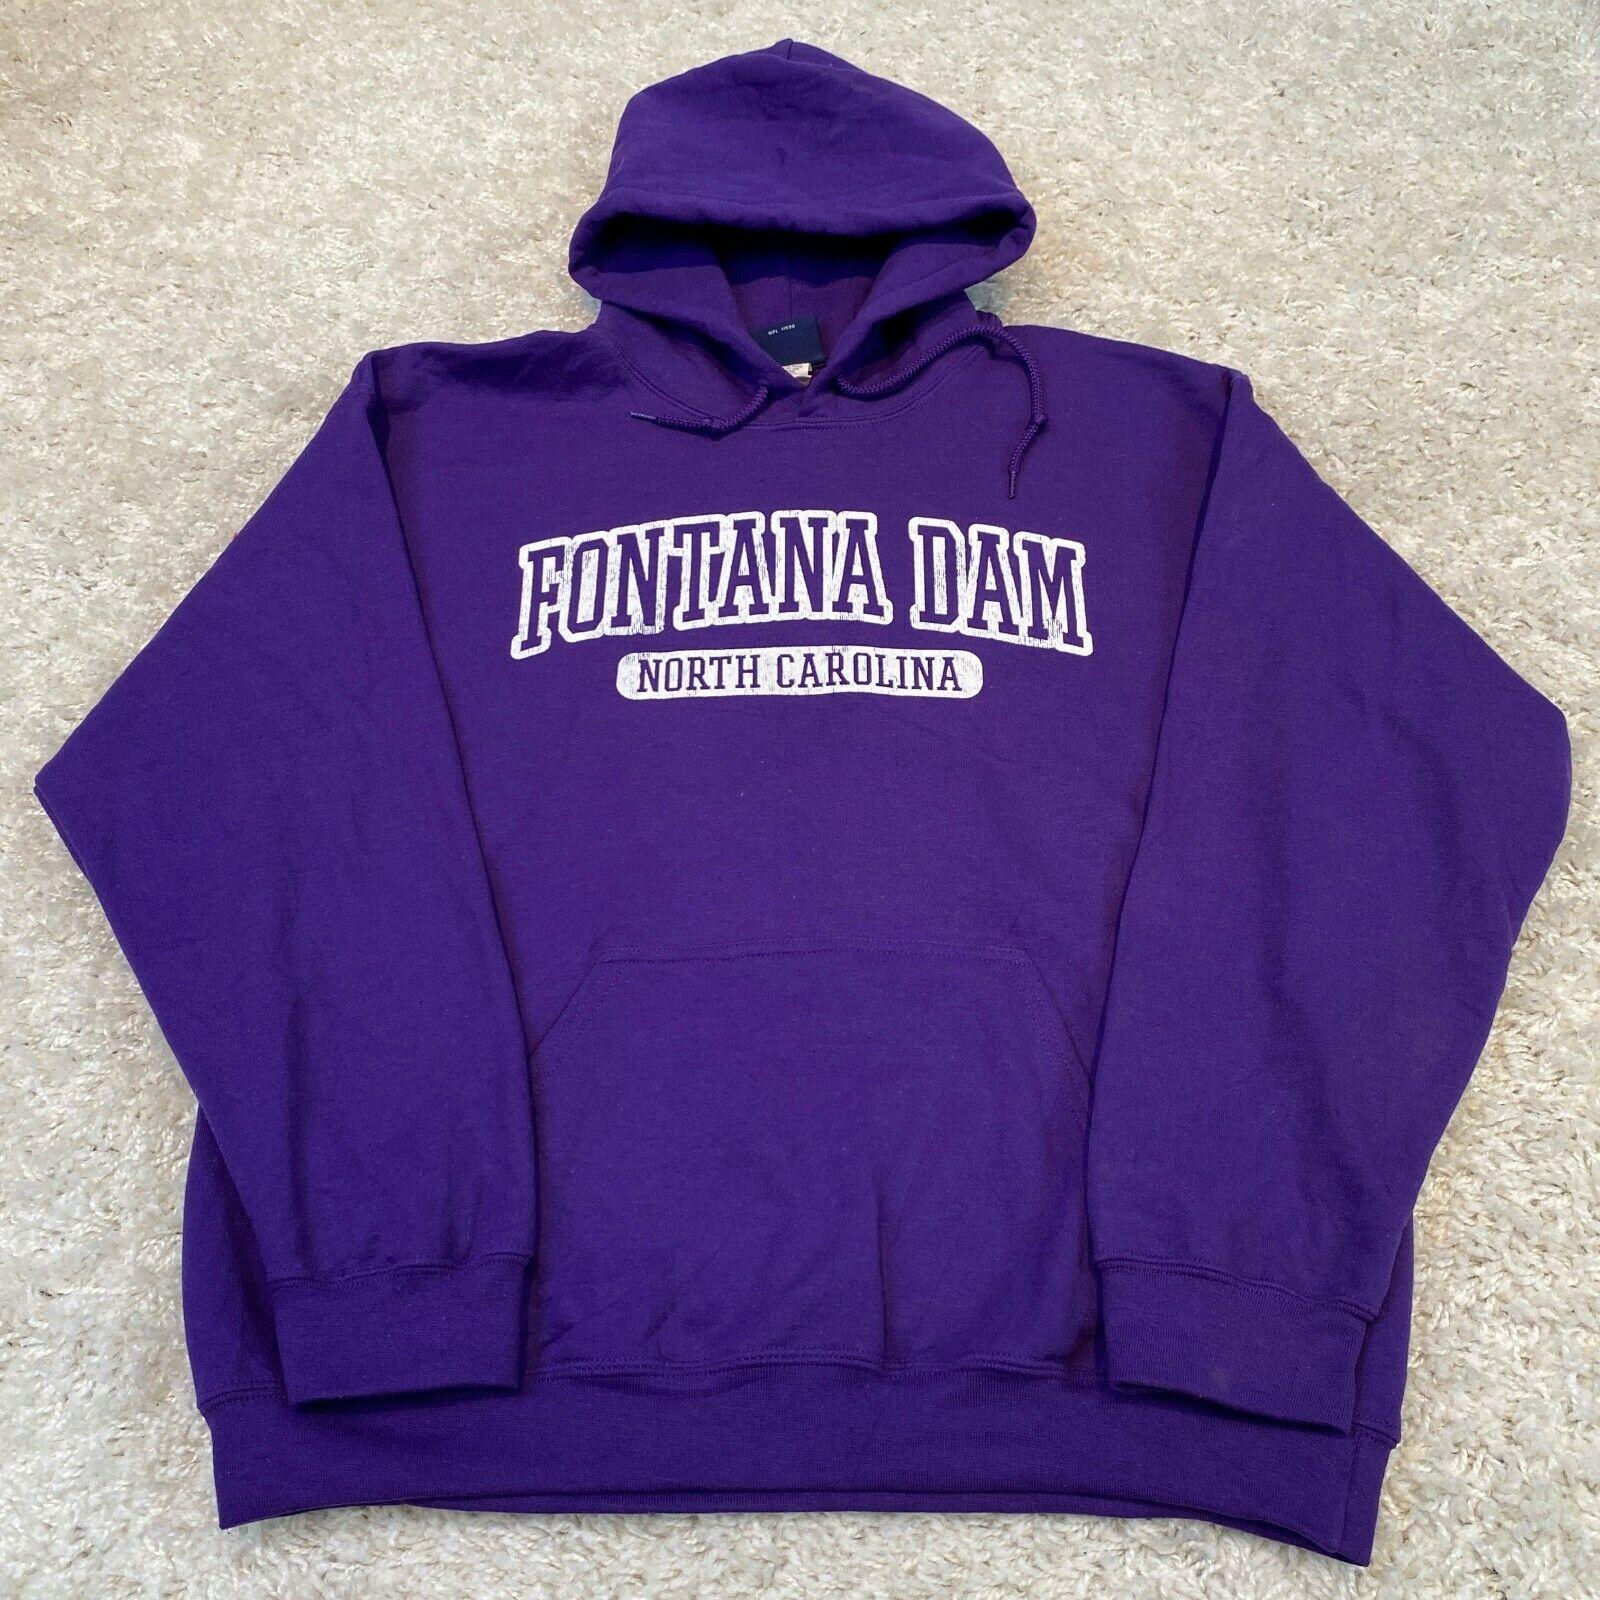 VINTAGE MV Sport Mens Hoodie Large Purple Fontana Dam North Carolina Sweatshirt